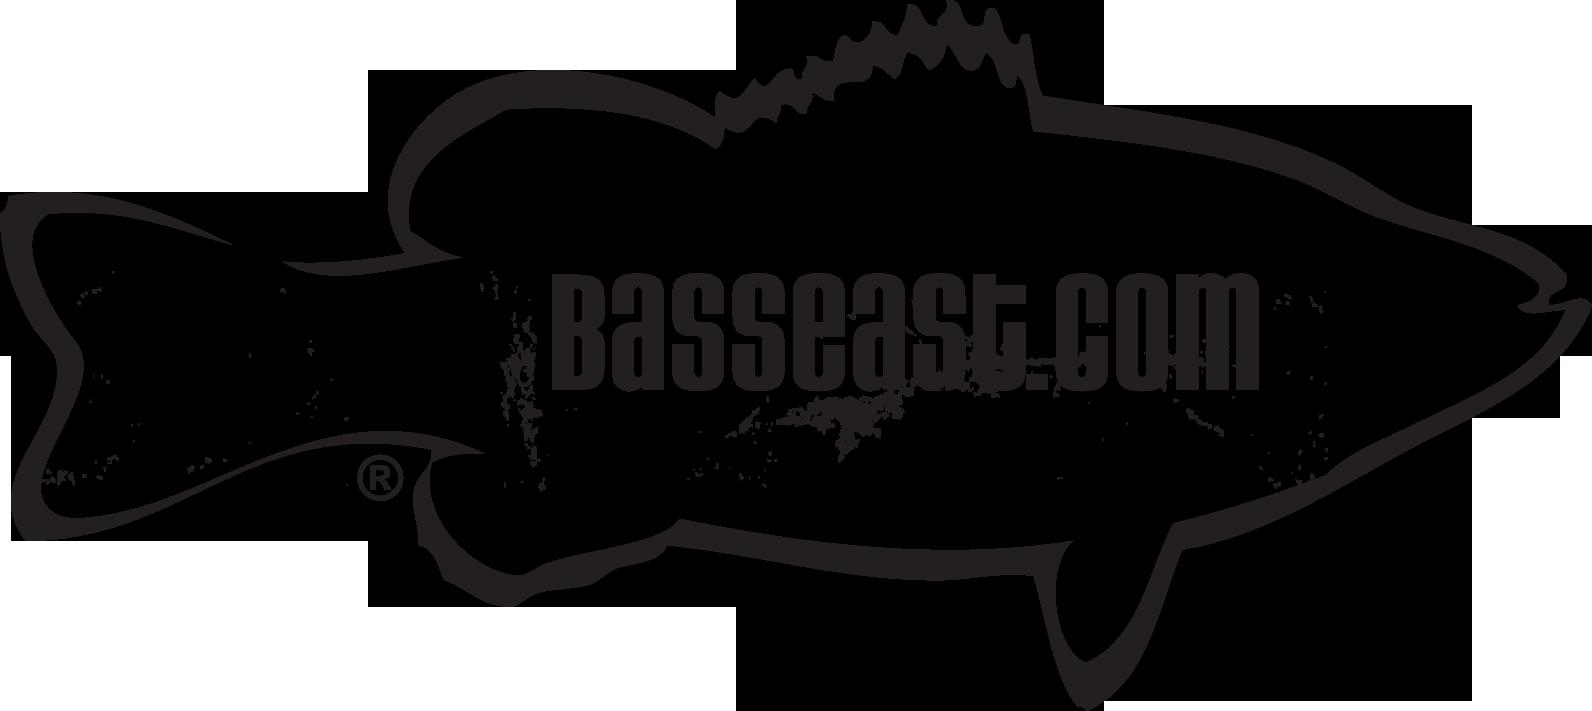 Free fishing logo design joy studio design gallery for Bass fishing logos